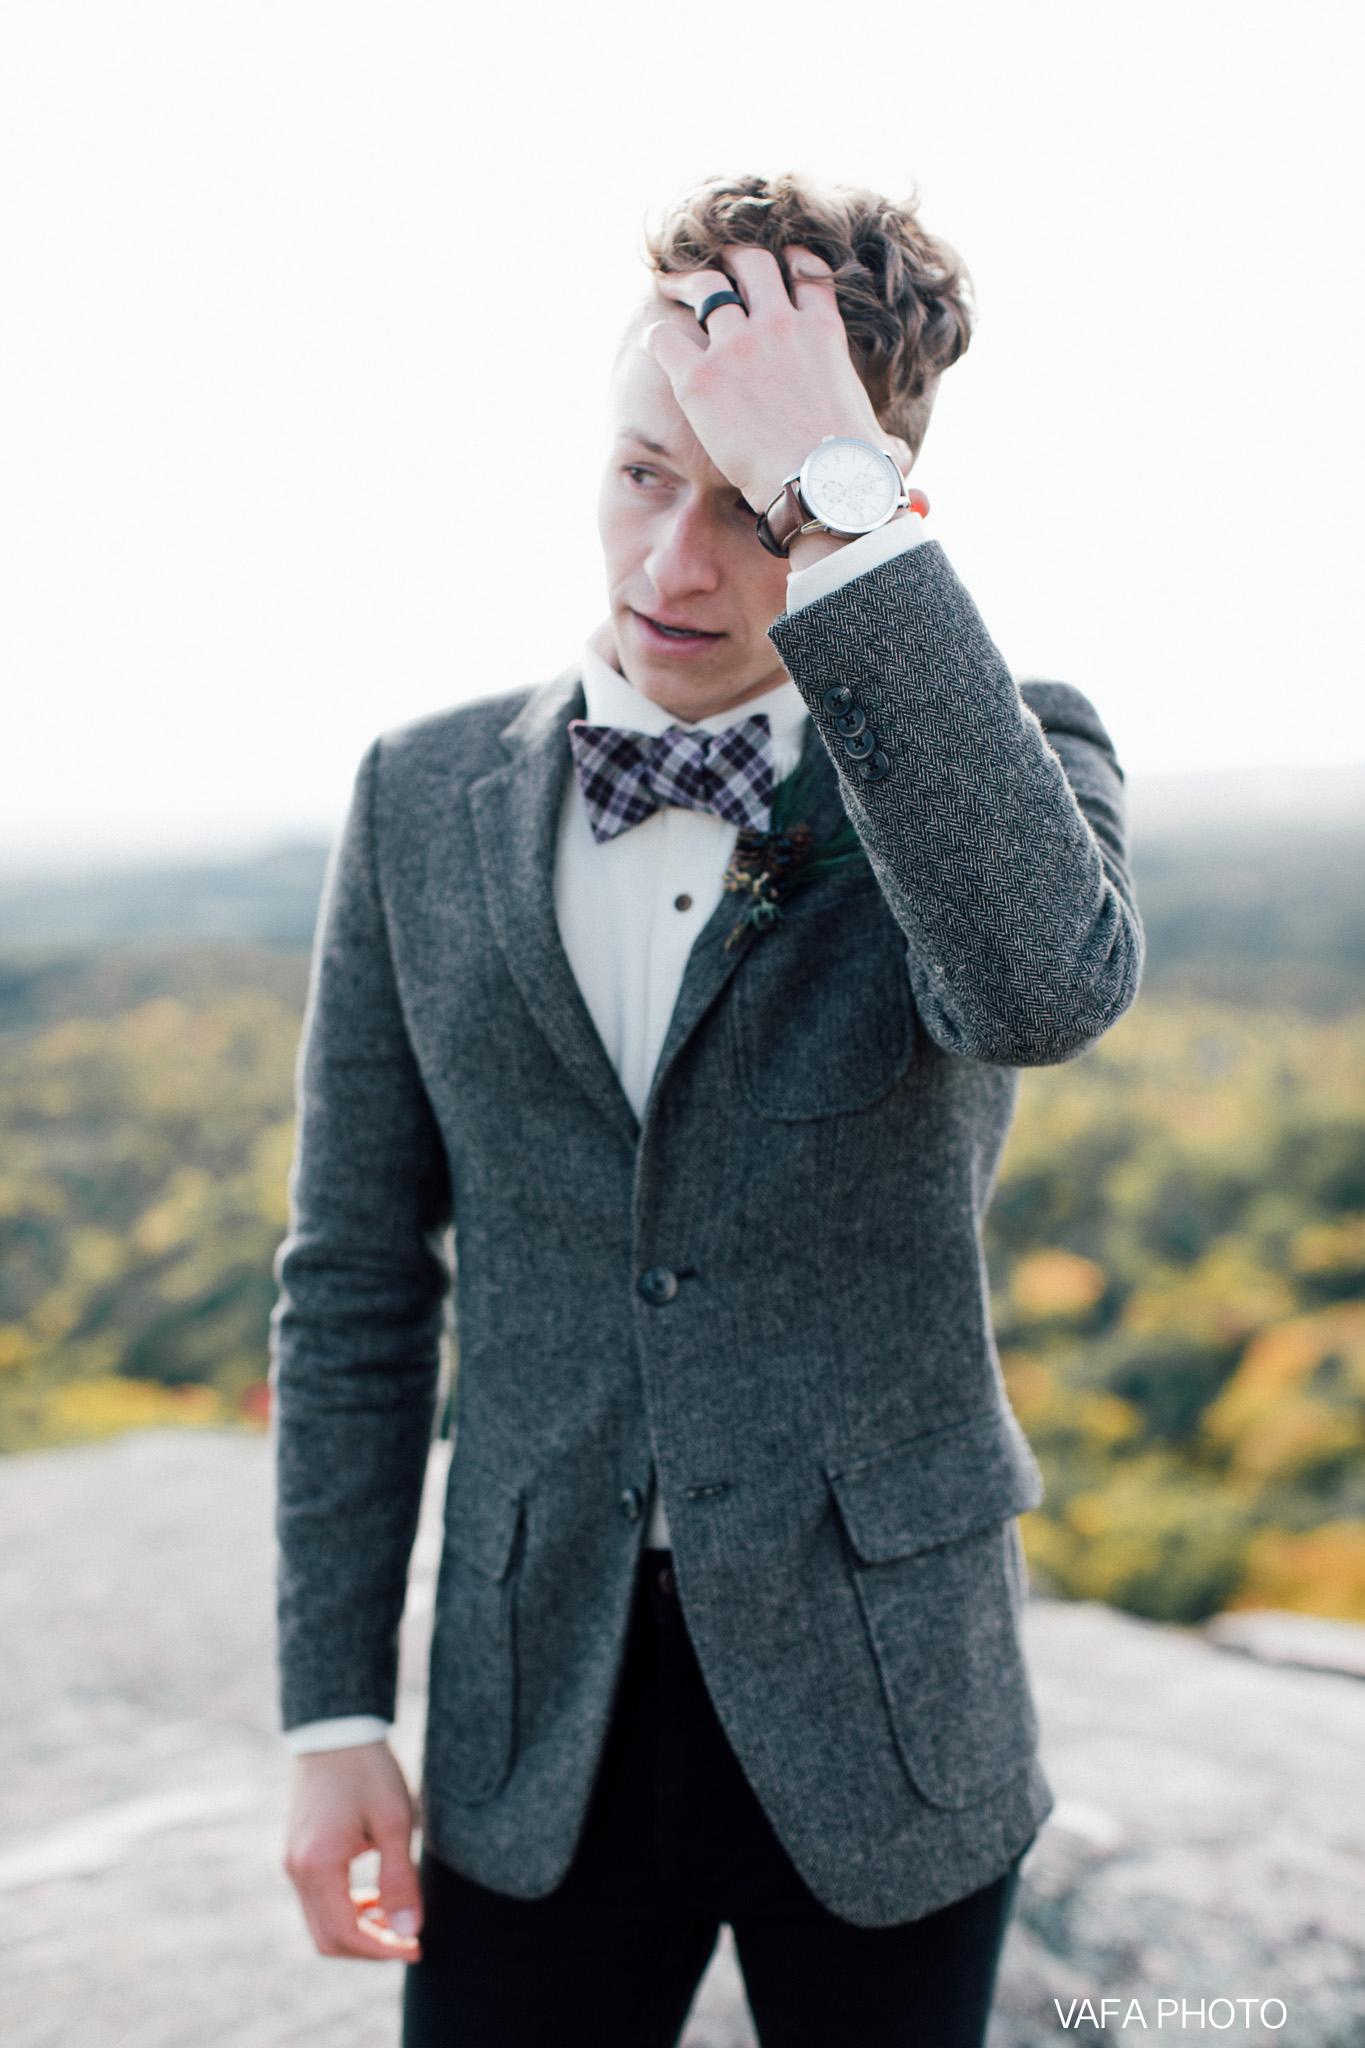 Hogback-Mountain-Wedding-Chelsea-Josh-Vafa-Photo-360.jpg